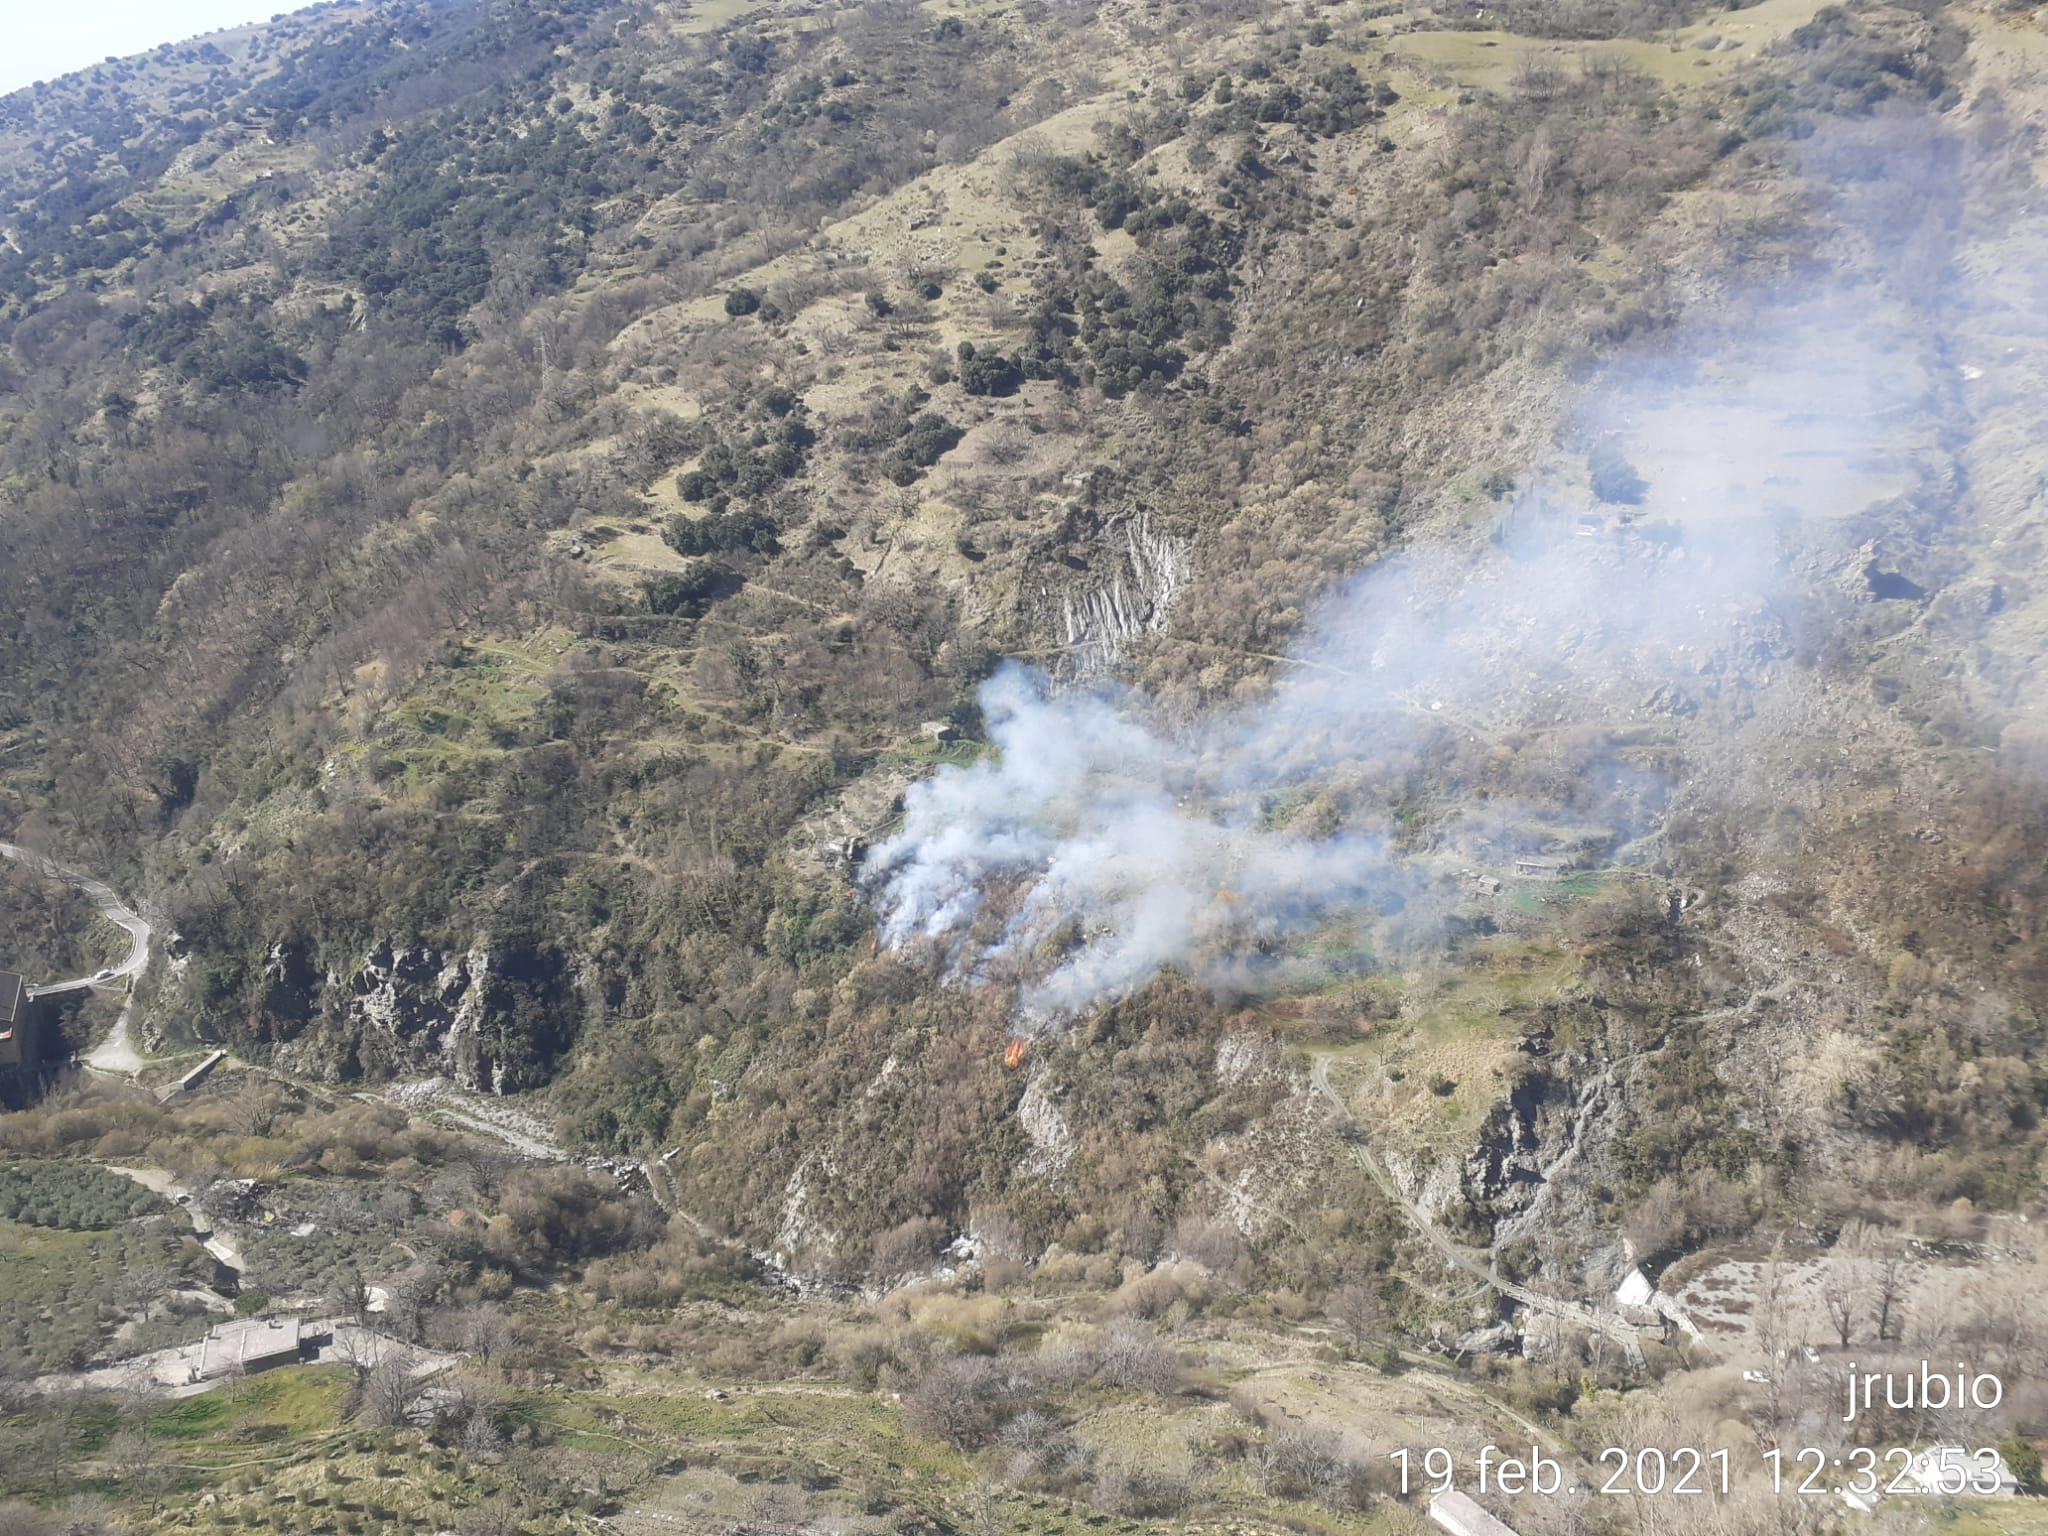 El Infoca trabaja para evitar que las llamas lleguen al fondo del Barranco de Poqueira